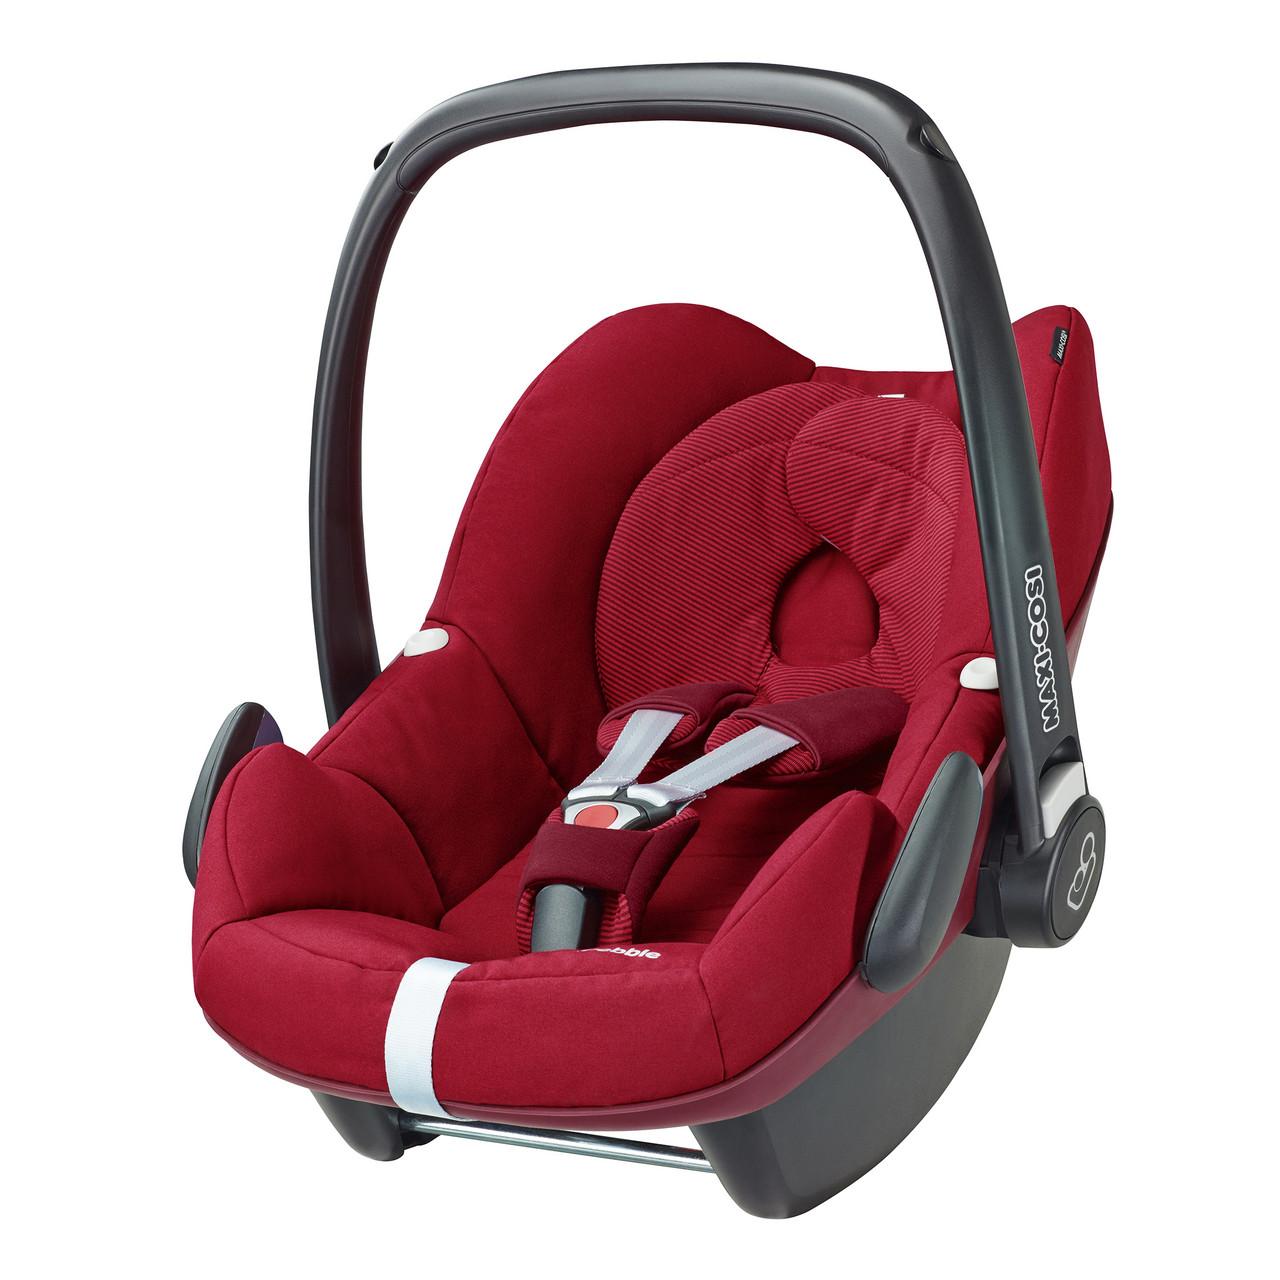 Автокресло Maxi Cosi Pebble 0-13 кг (63079660) Robin Red (тёмно-красный)